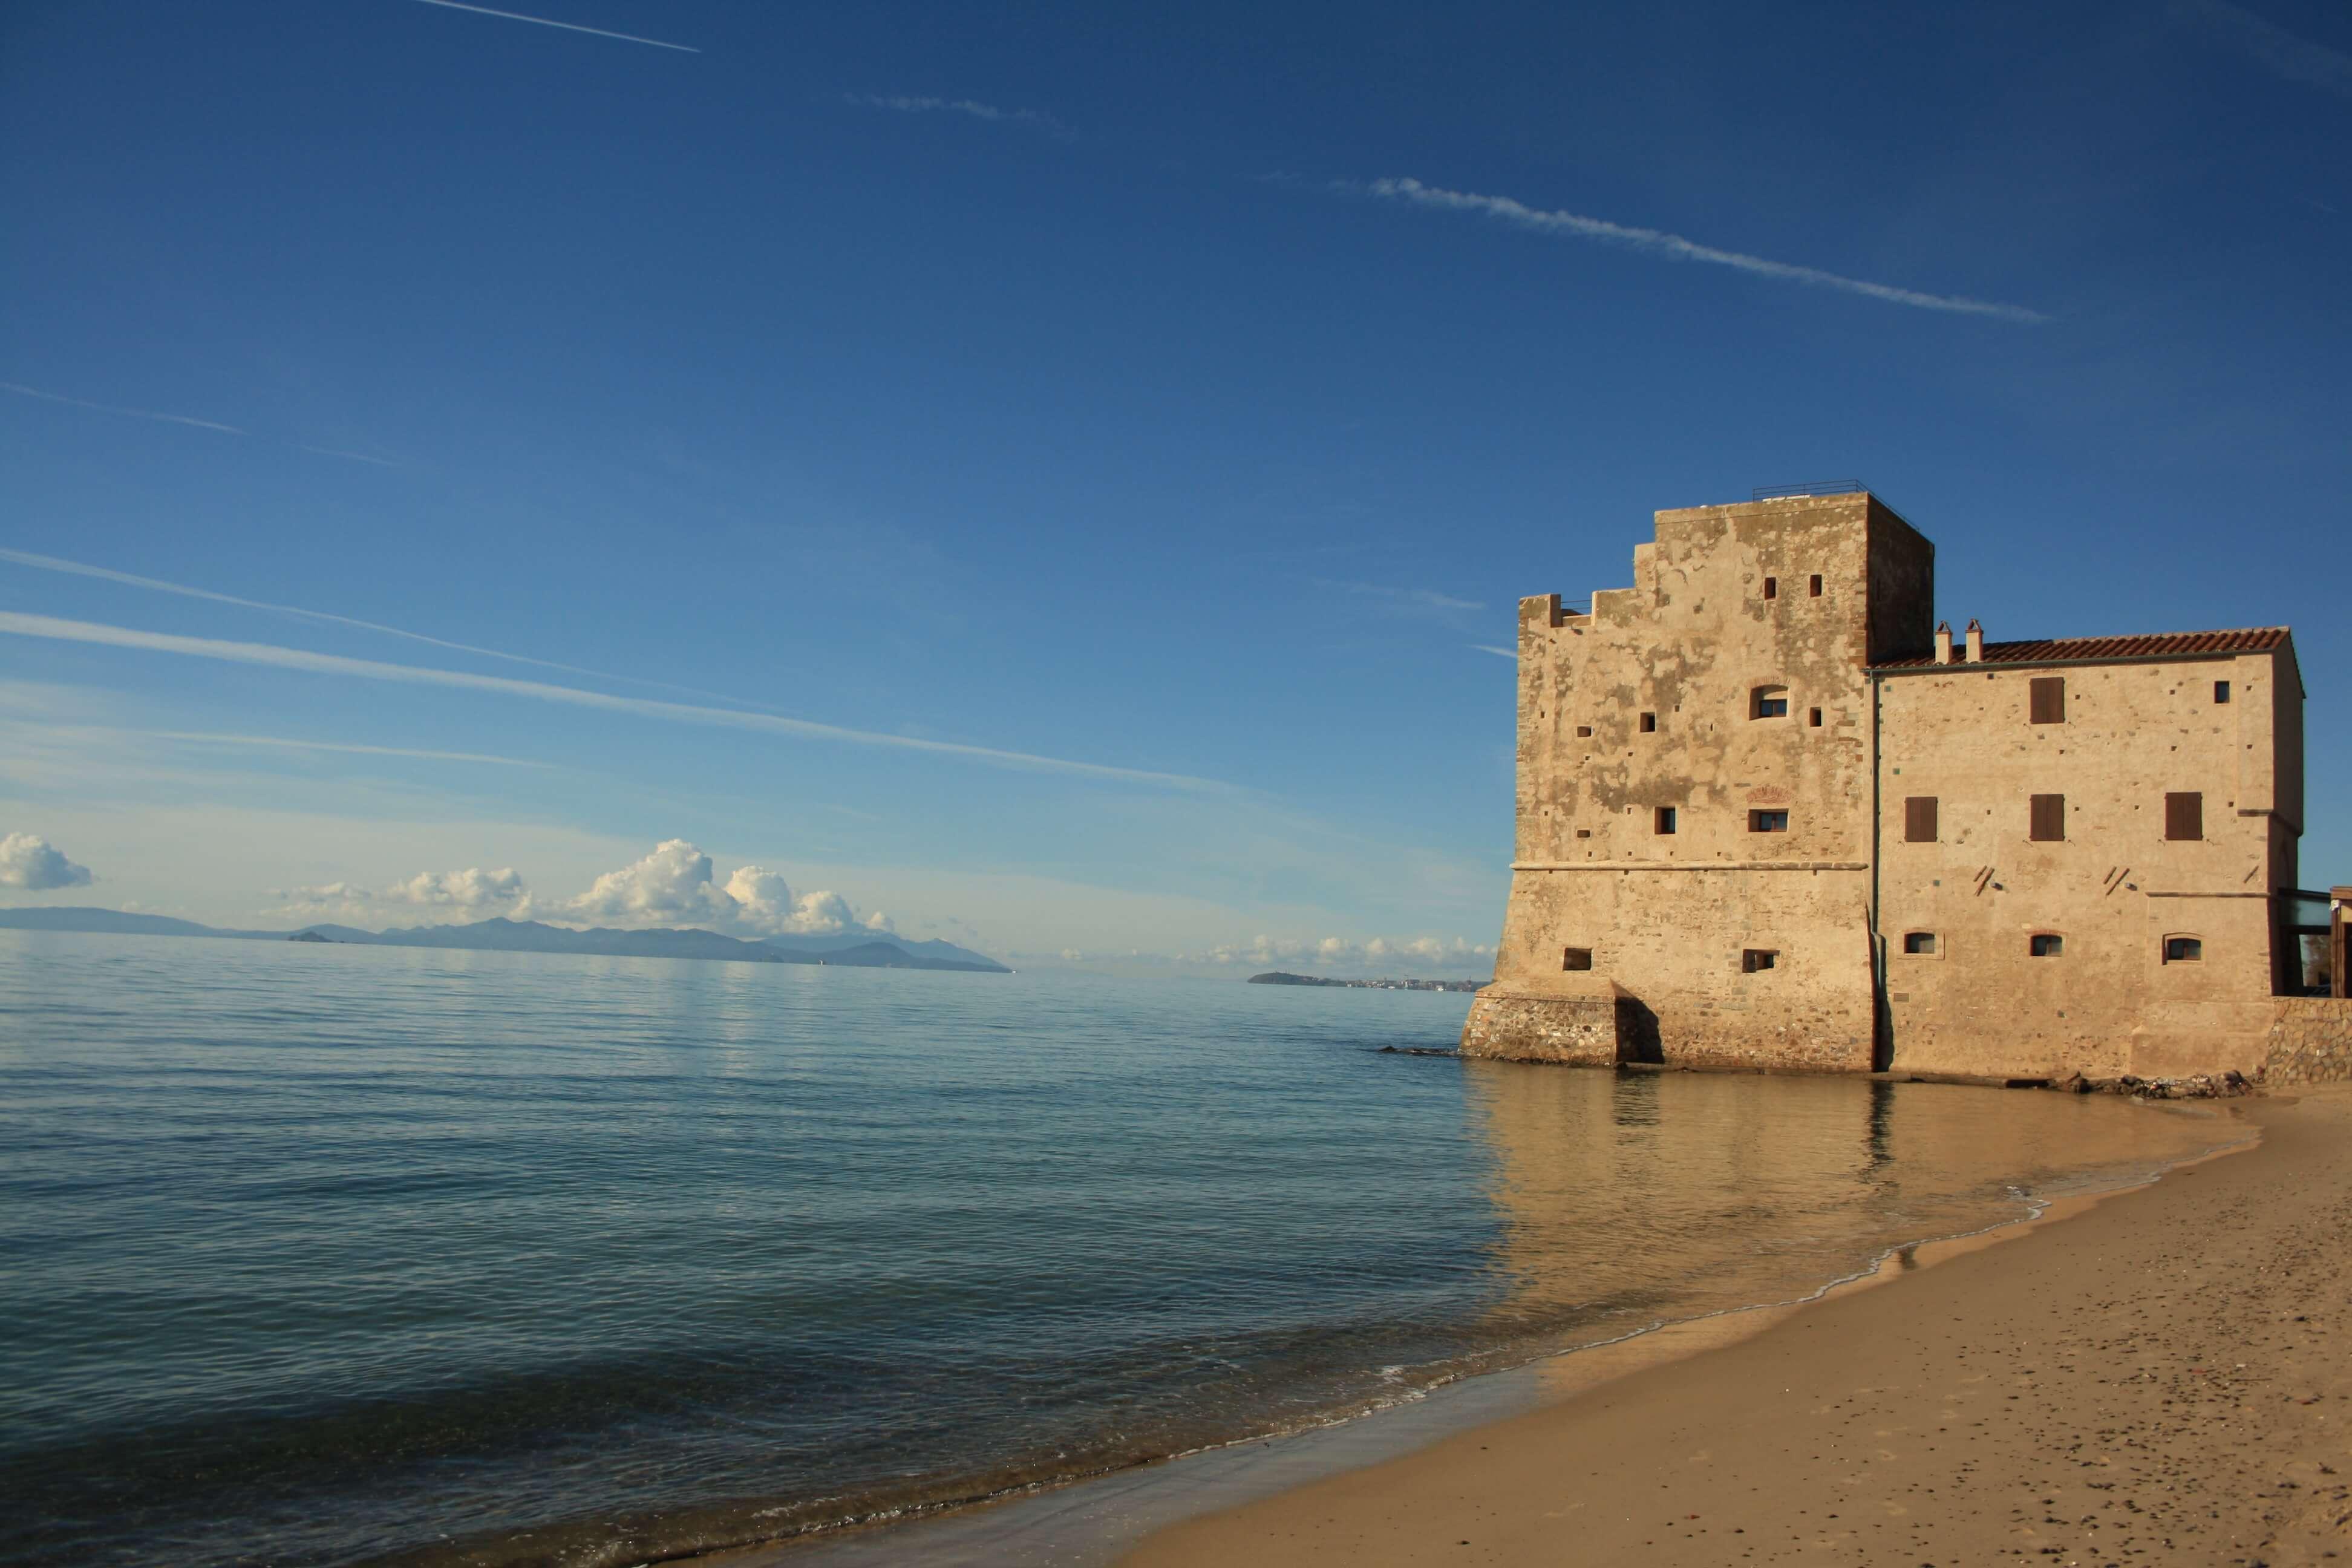 Le spiagge più belle di Toscana: Torre Mozza